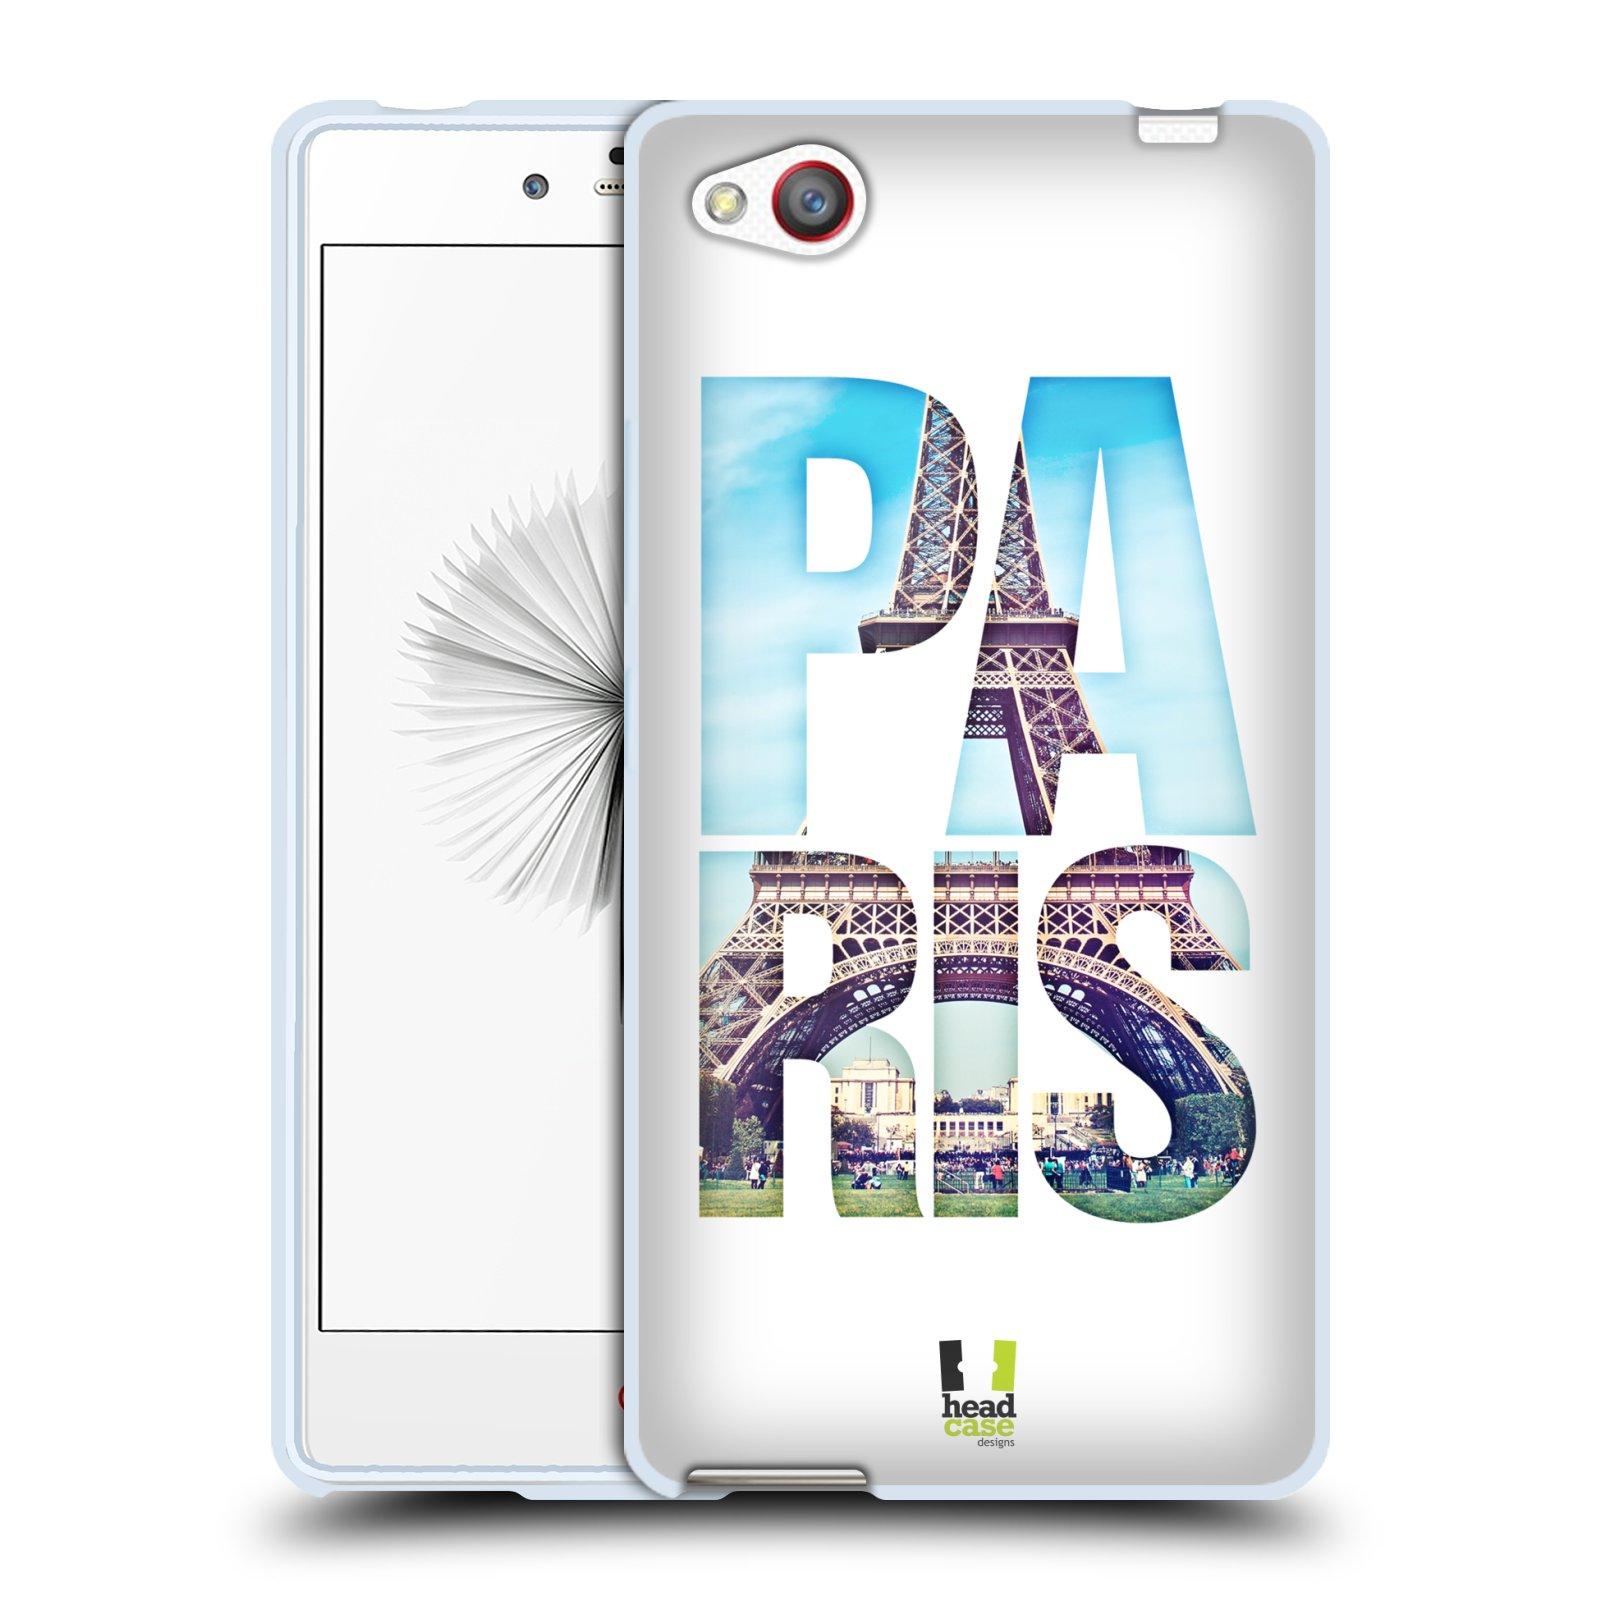 HEAD CASE silikonový obal na mobil ZTE NUBIA Z9 MINI vzor Města foto a nadpis FRANCIE, PAŘÍŽ, EIFFELOVA VĚŽ